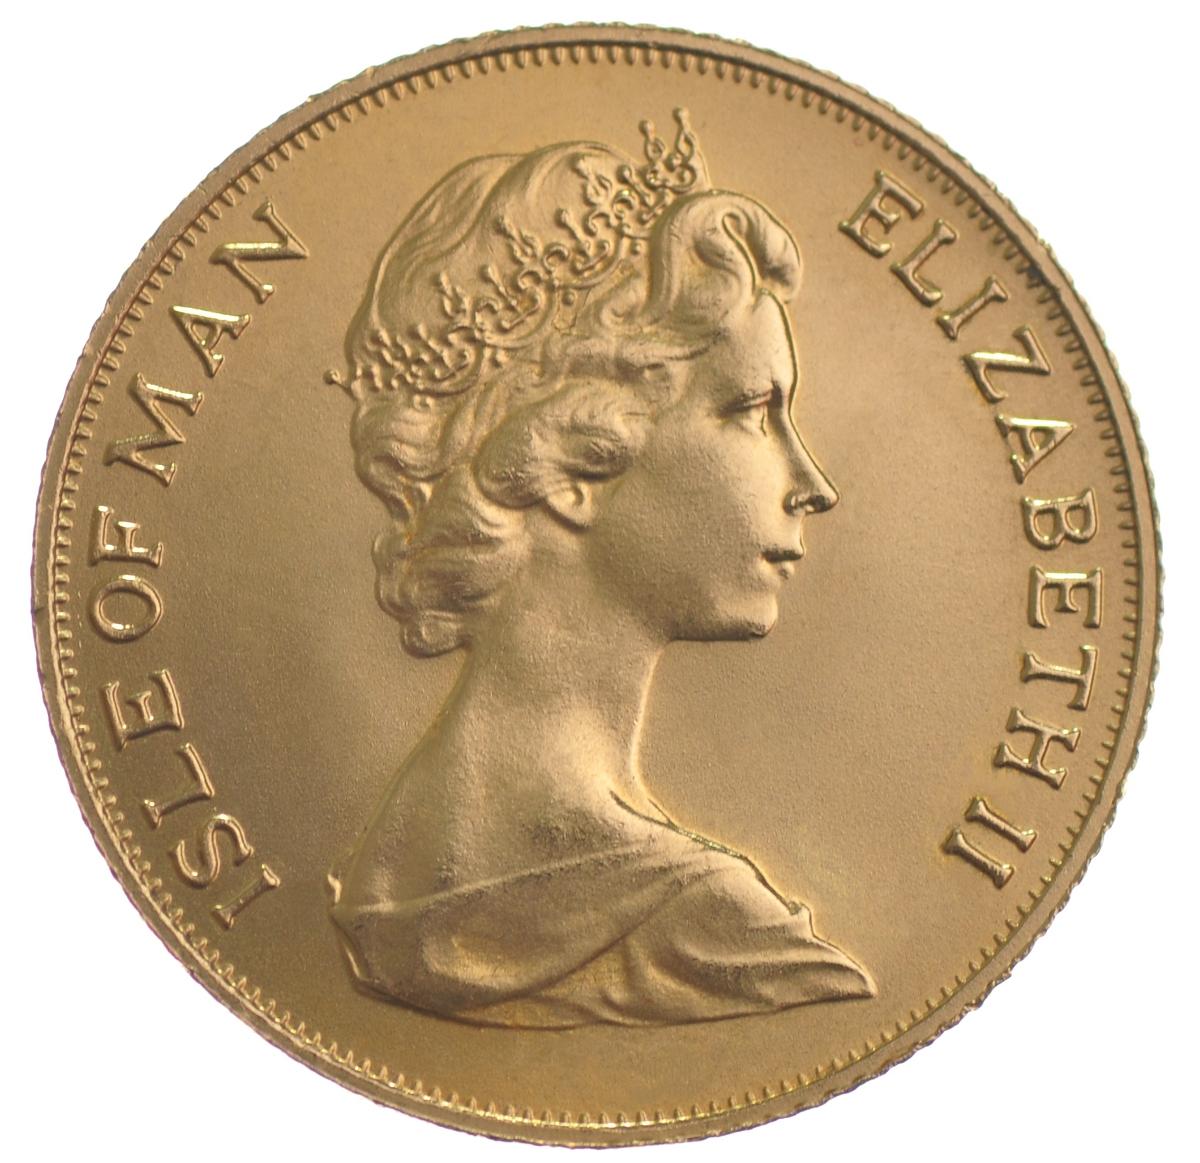 1975 Gold Sovereign Elizabeth Ii Decimal Portrait Iom